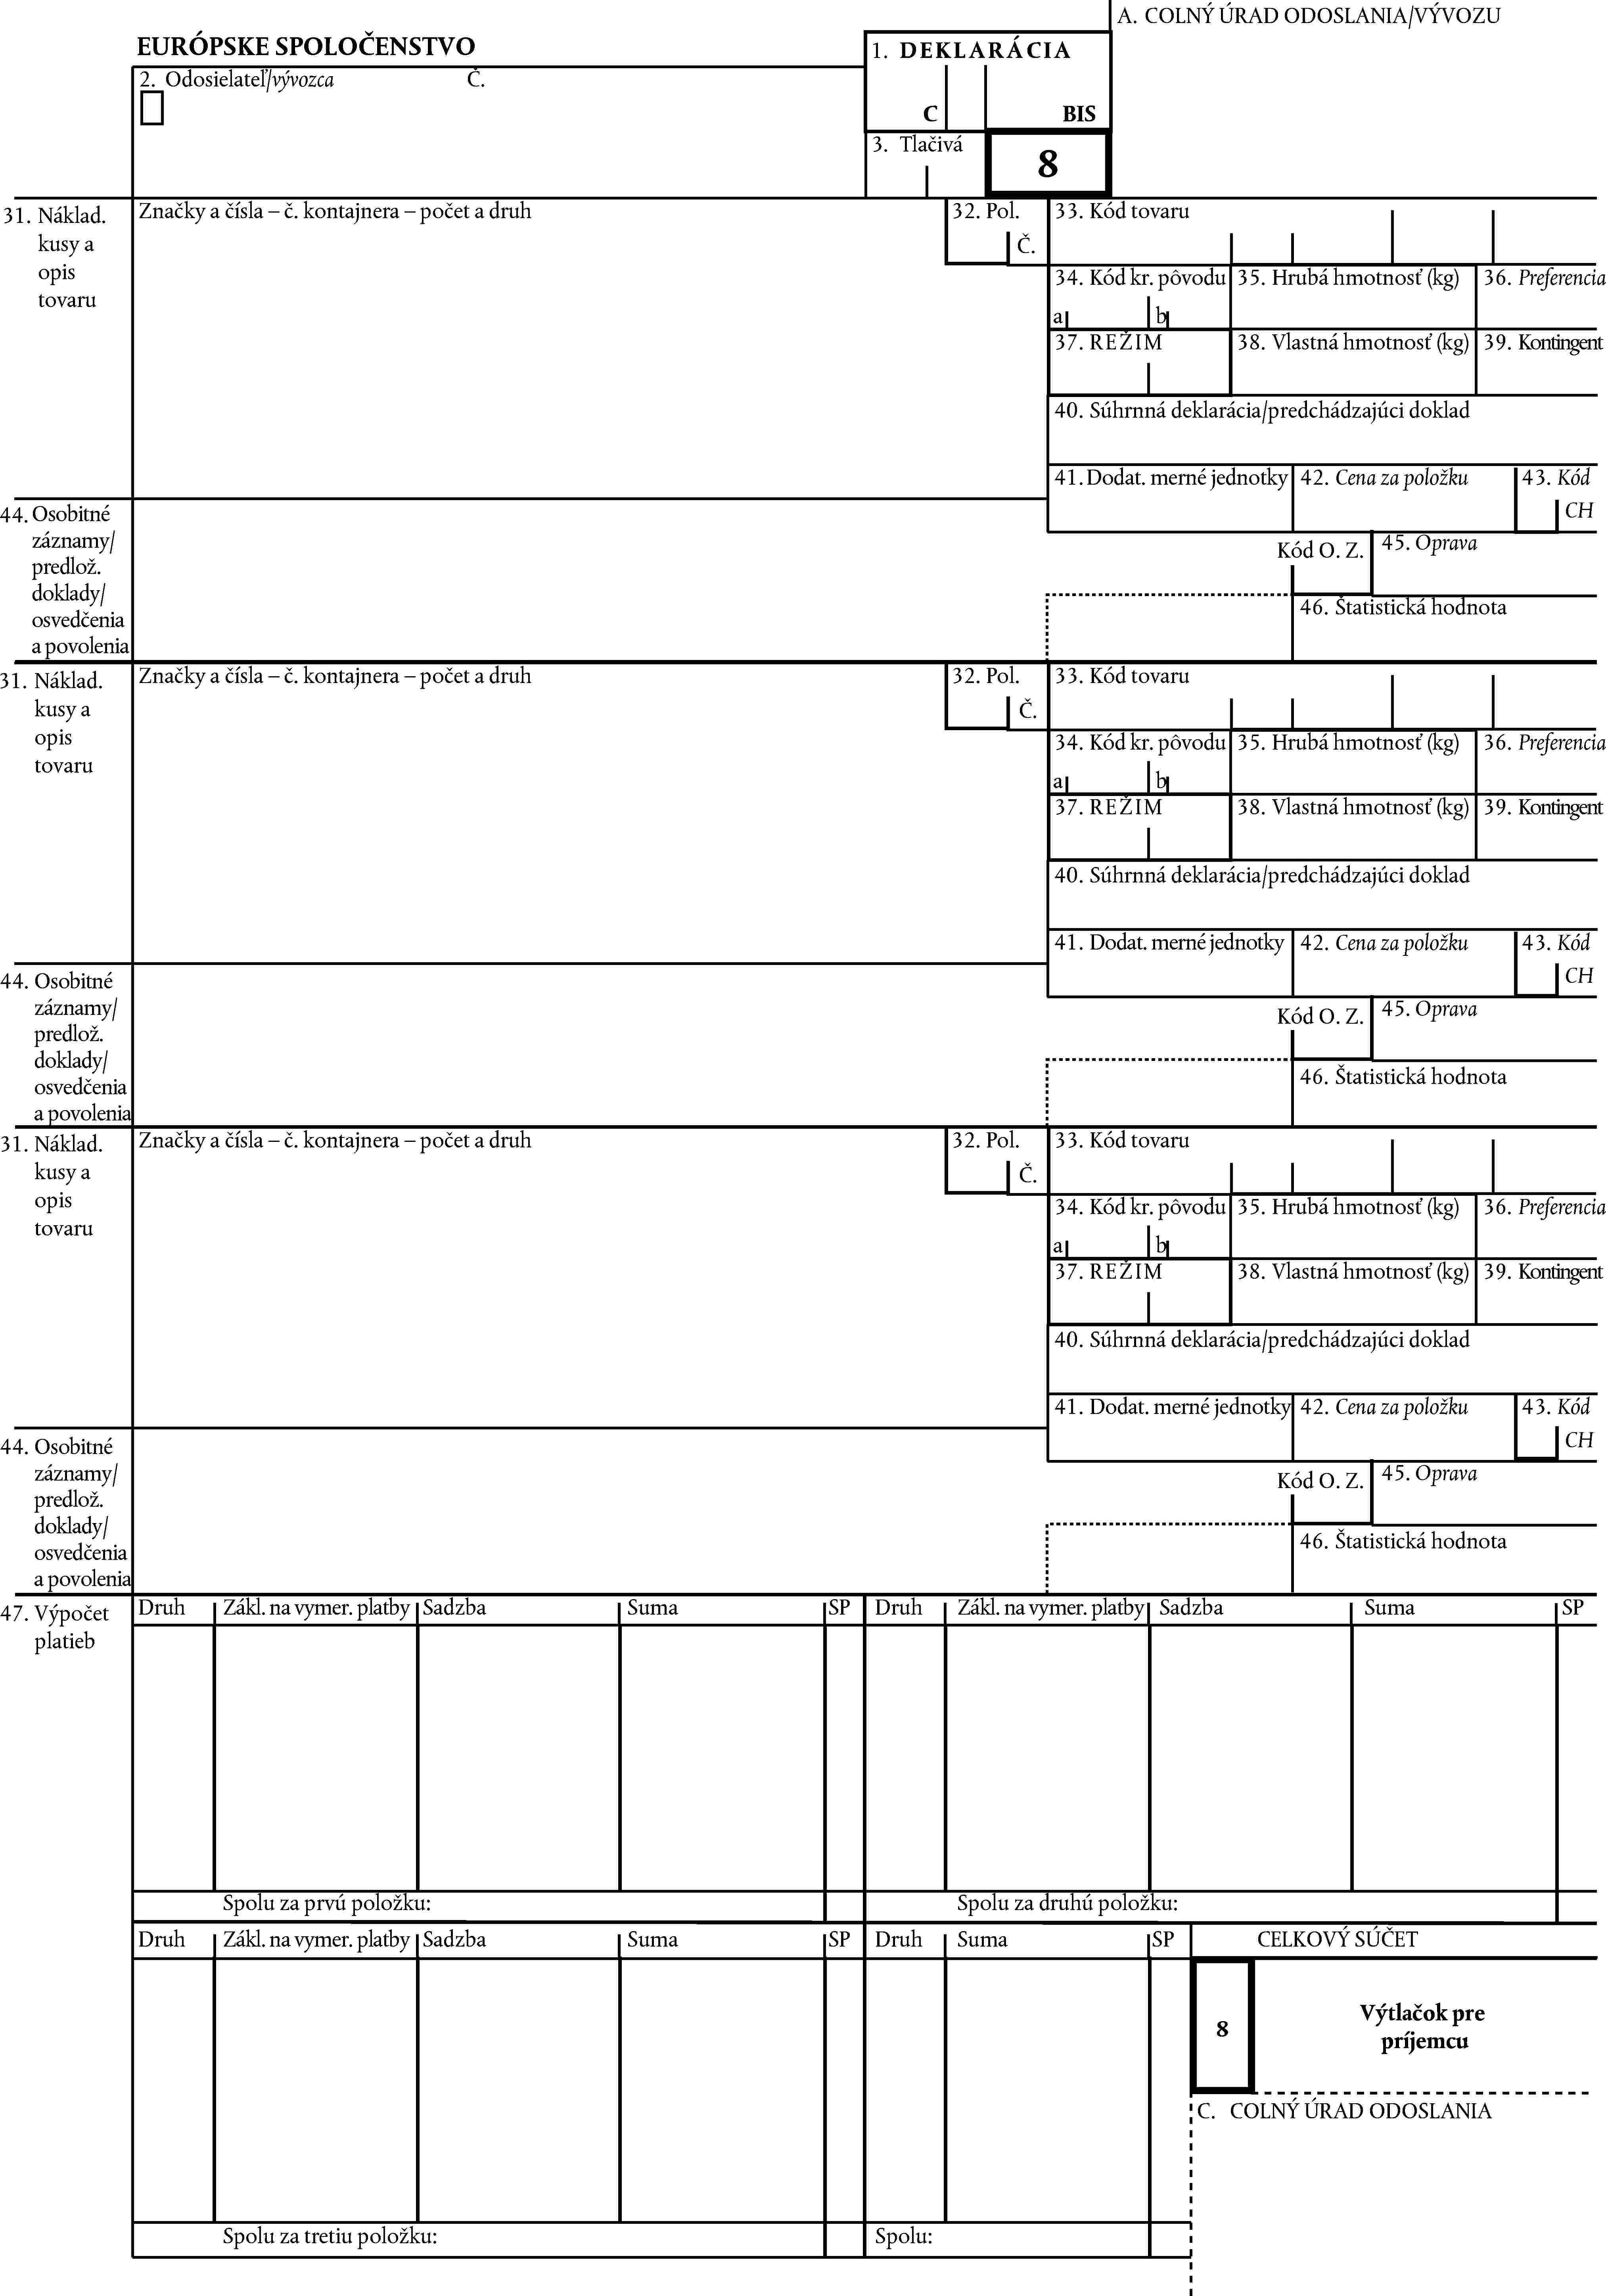 36f68f7744f6 EUR-Lex - 01993R2454-20060701 - EN - EUR-Lex